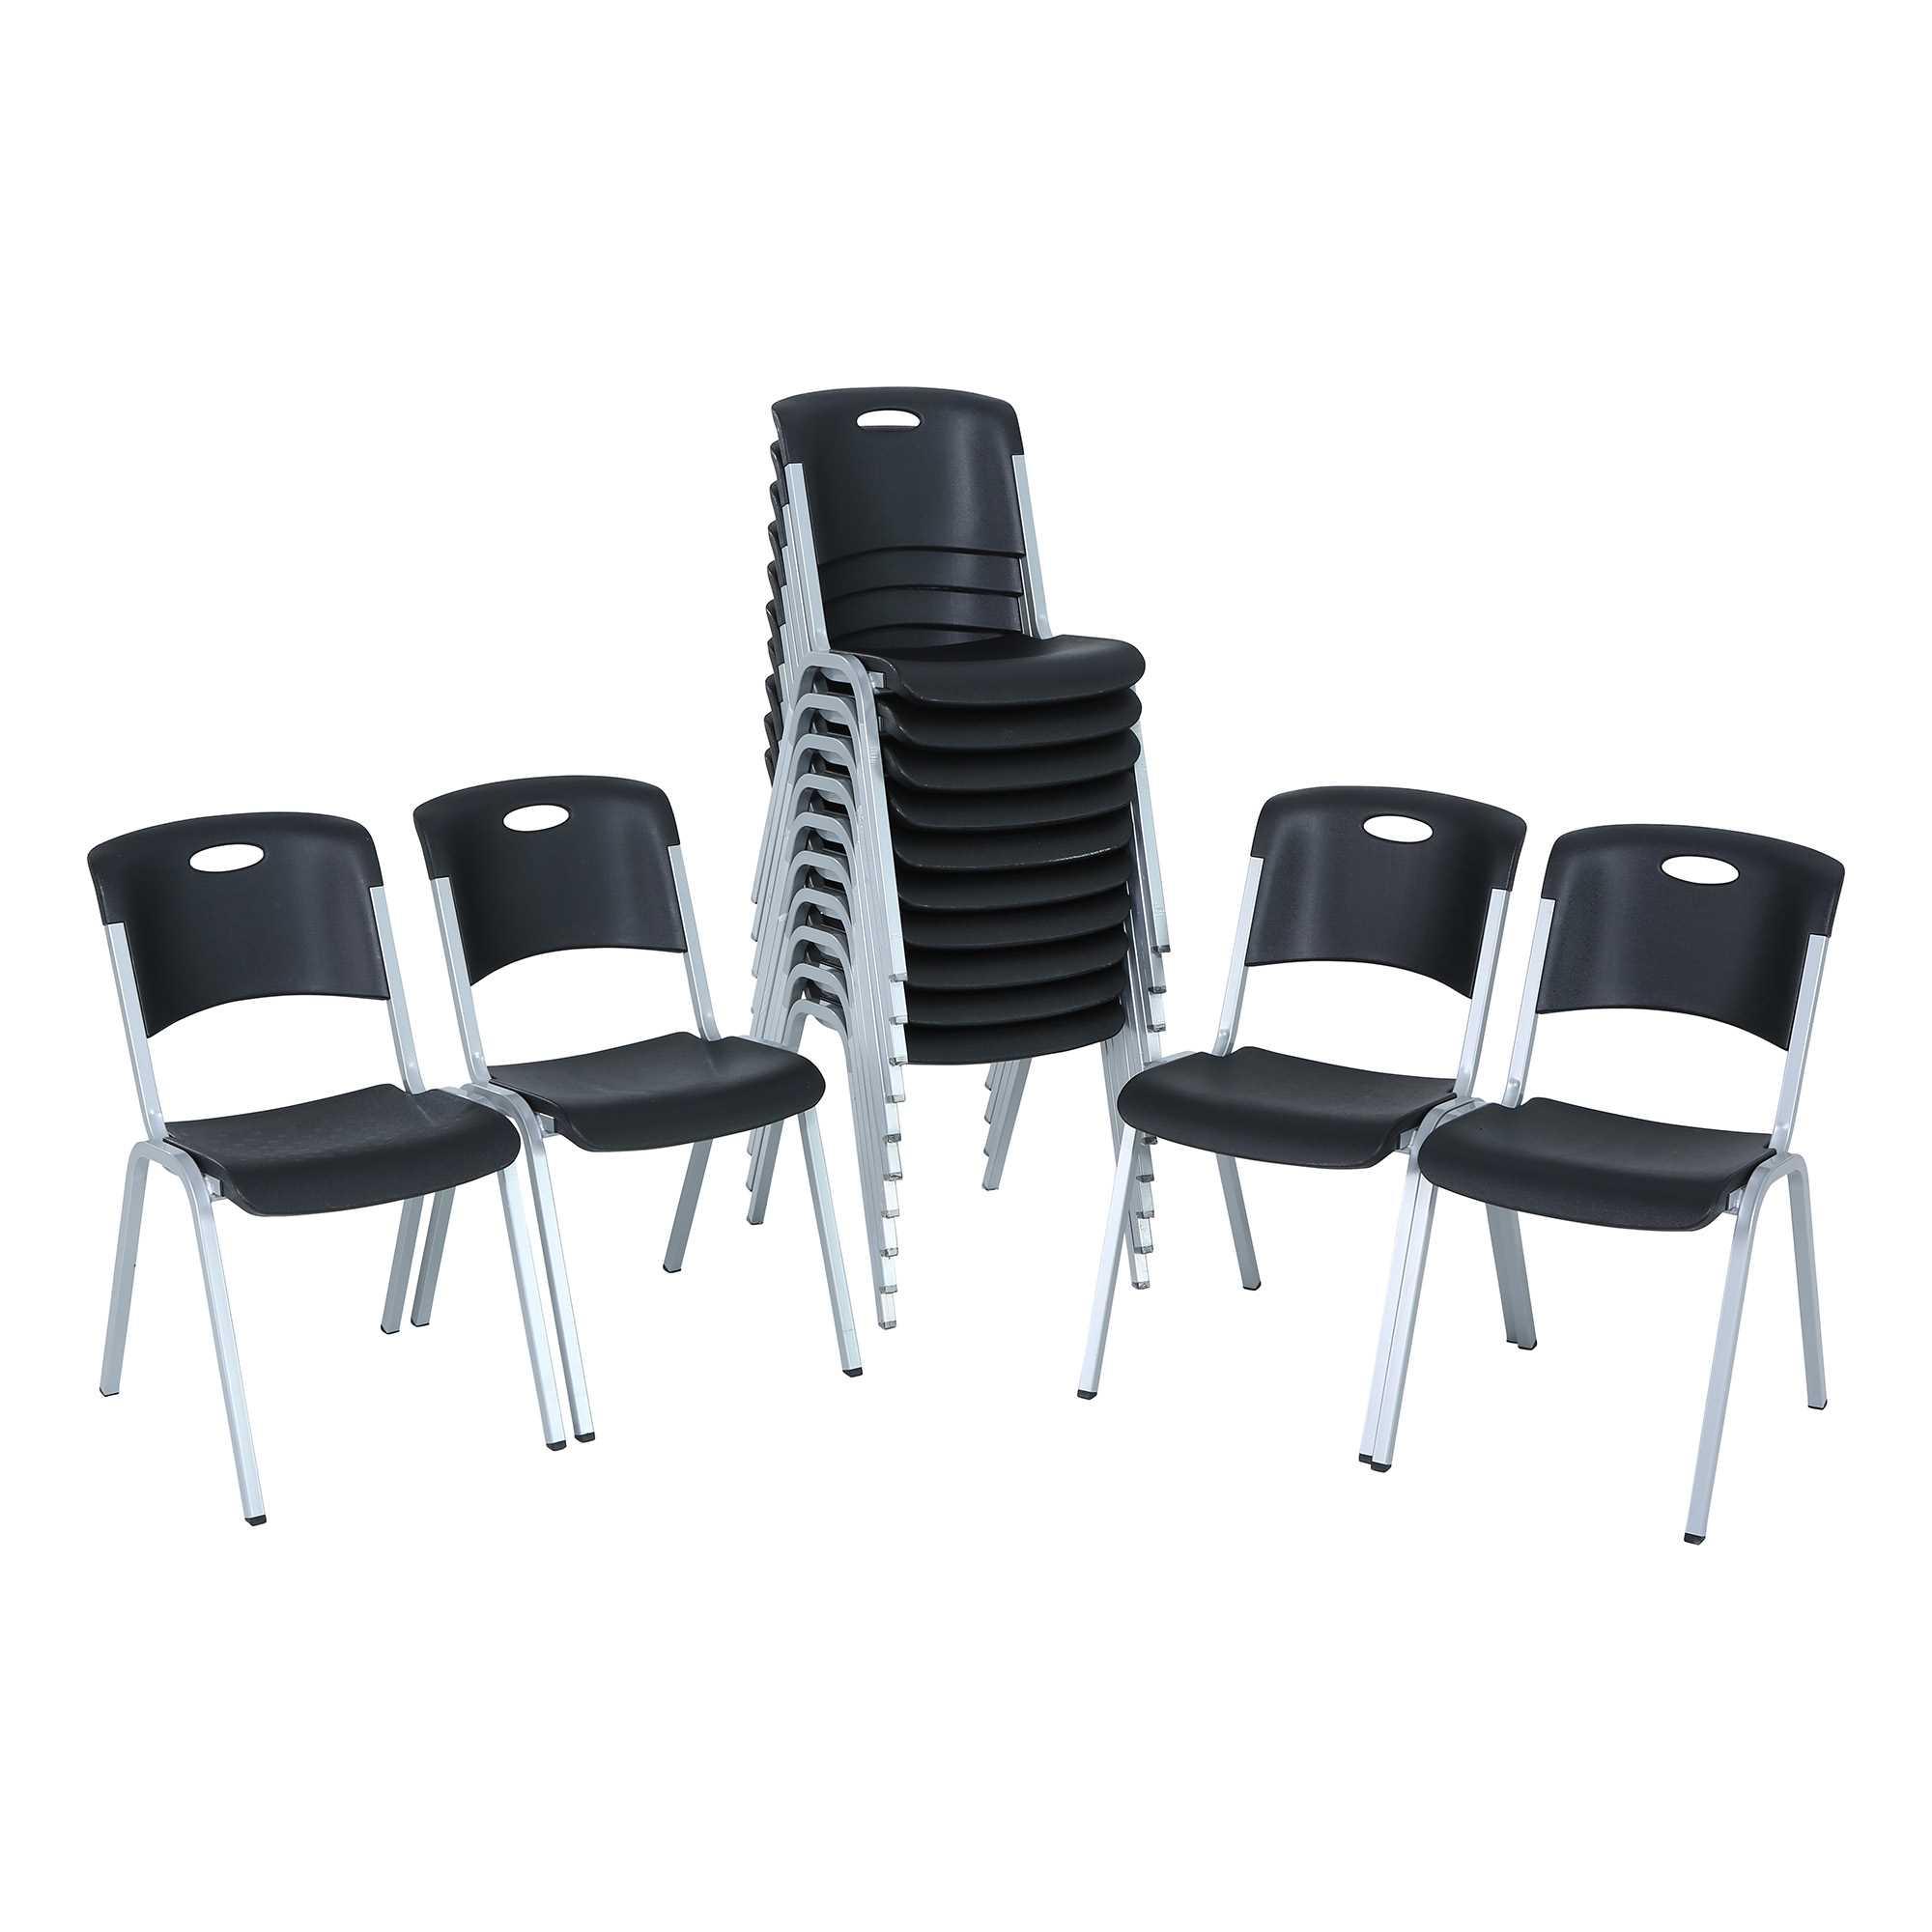 Lifetime Premium Black Stacking Chair